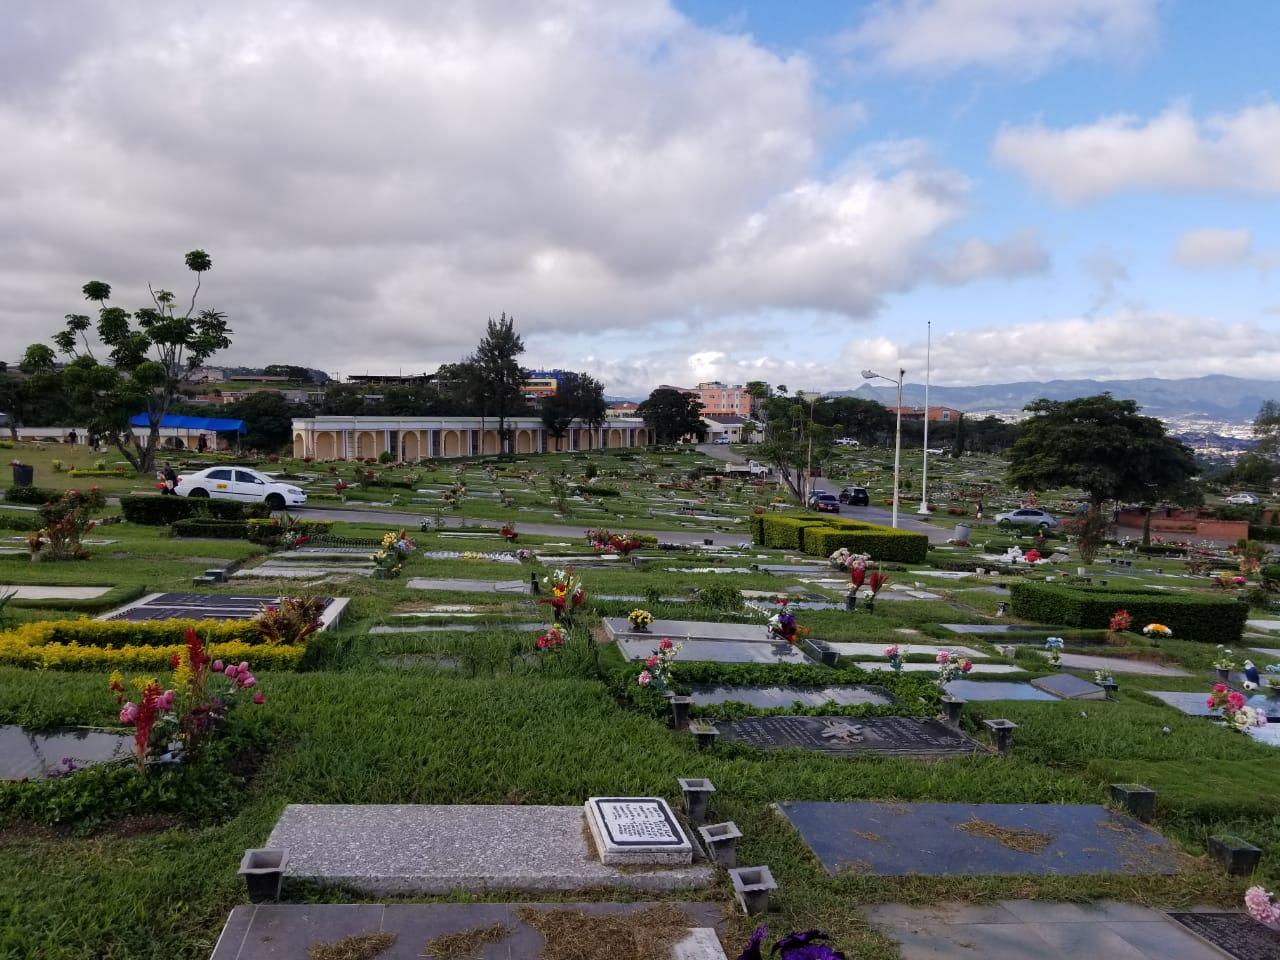 Imagen panorámica de un cementerio